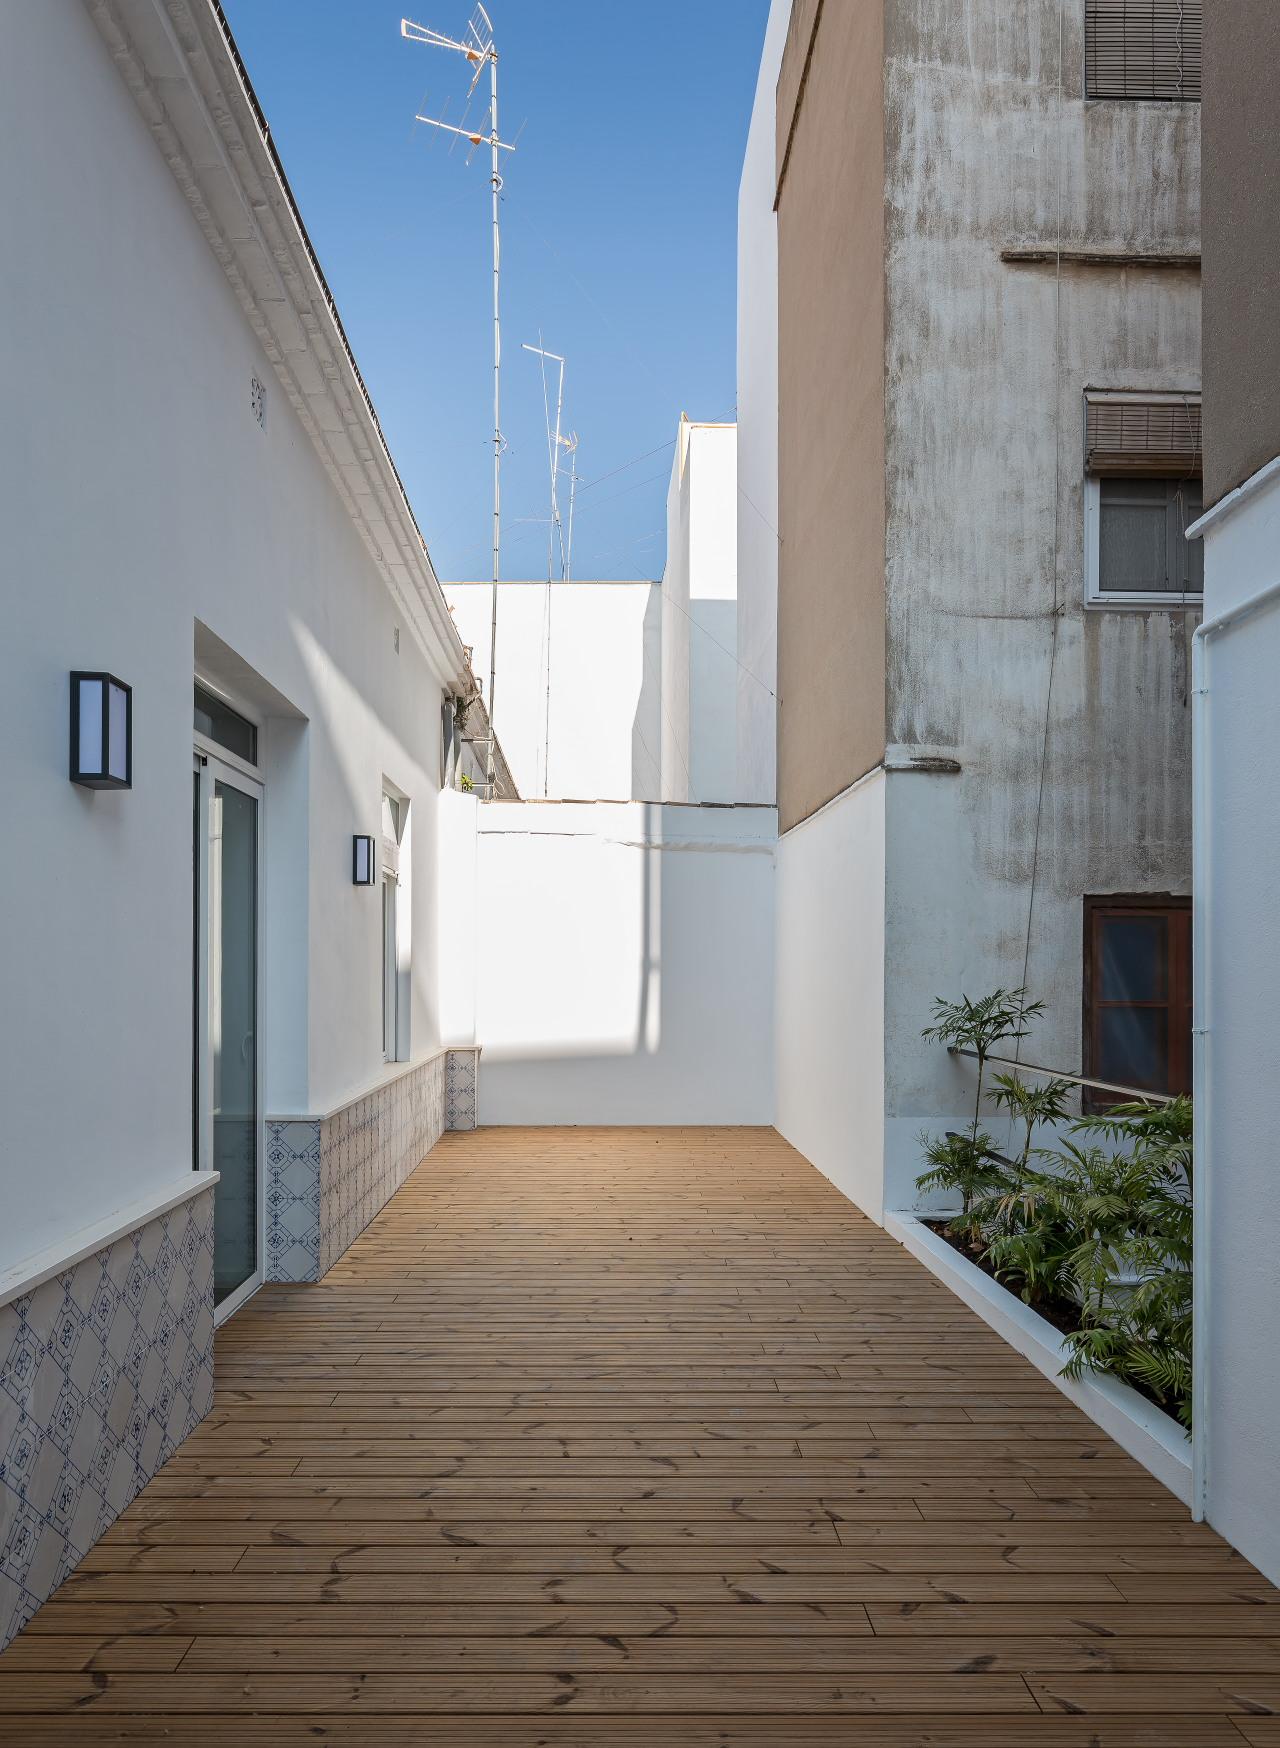 fotografia-arquitectura-valencia-german-cabo-viraje-rehabilitacion-campanar (31)